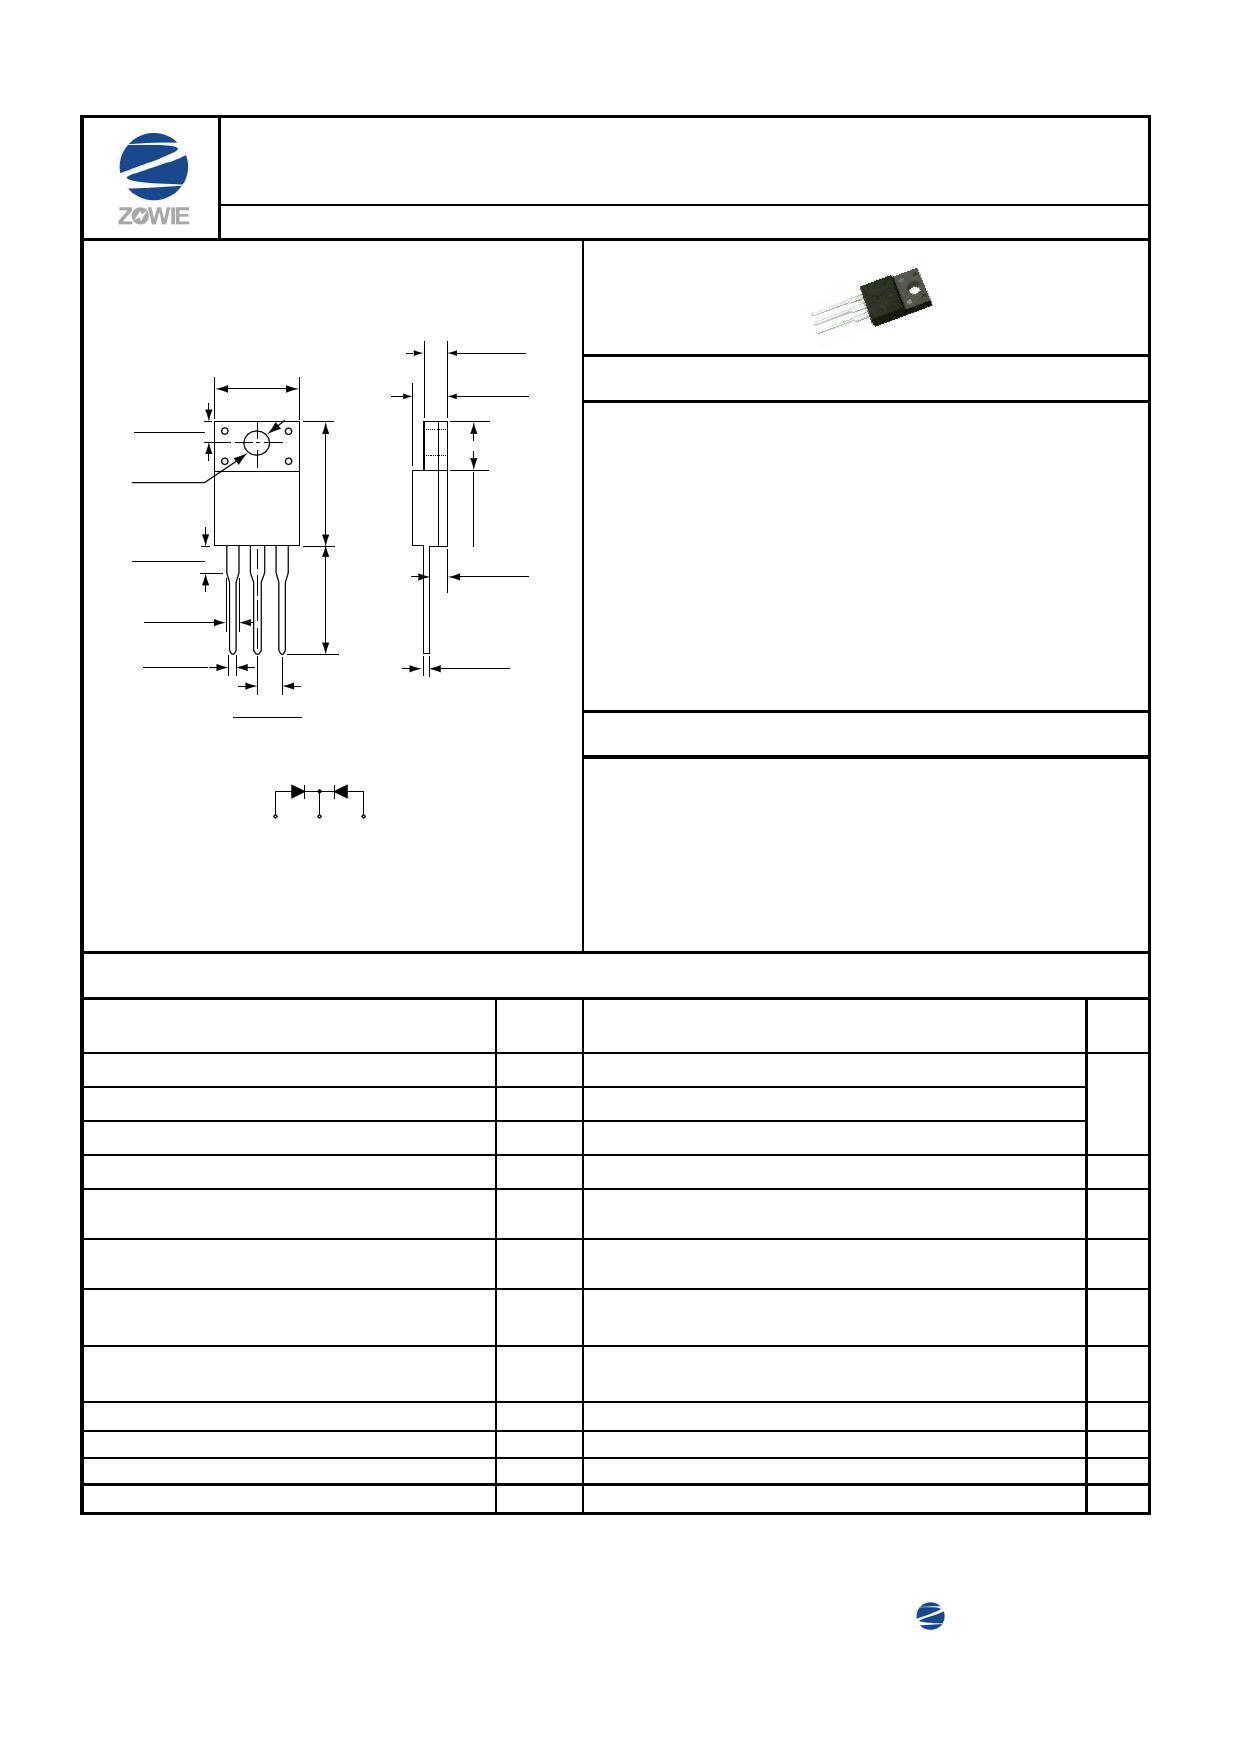 MBR10100CFSH Datasheet, MBR10100CFSH PDF,ピン配置, 機能